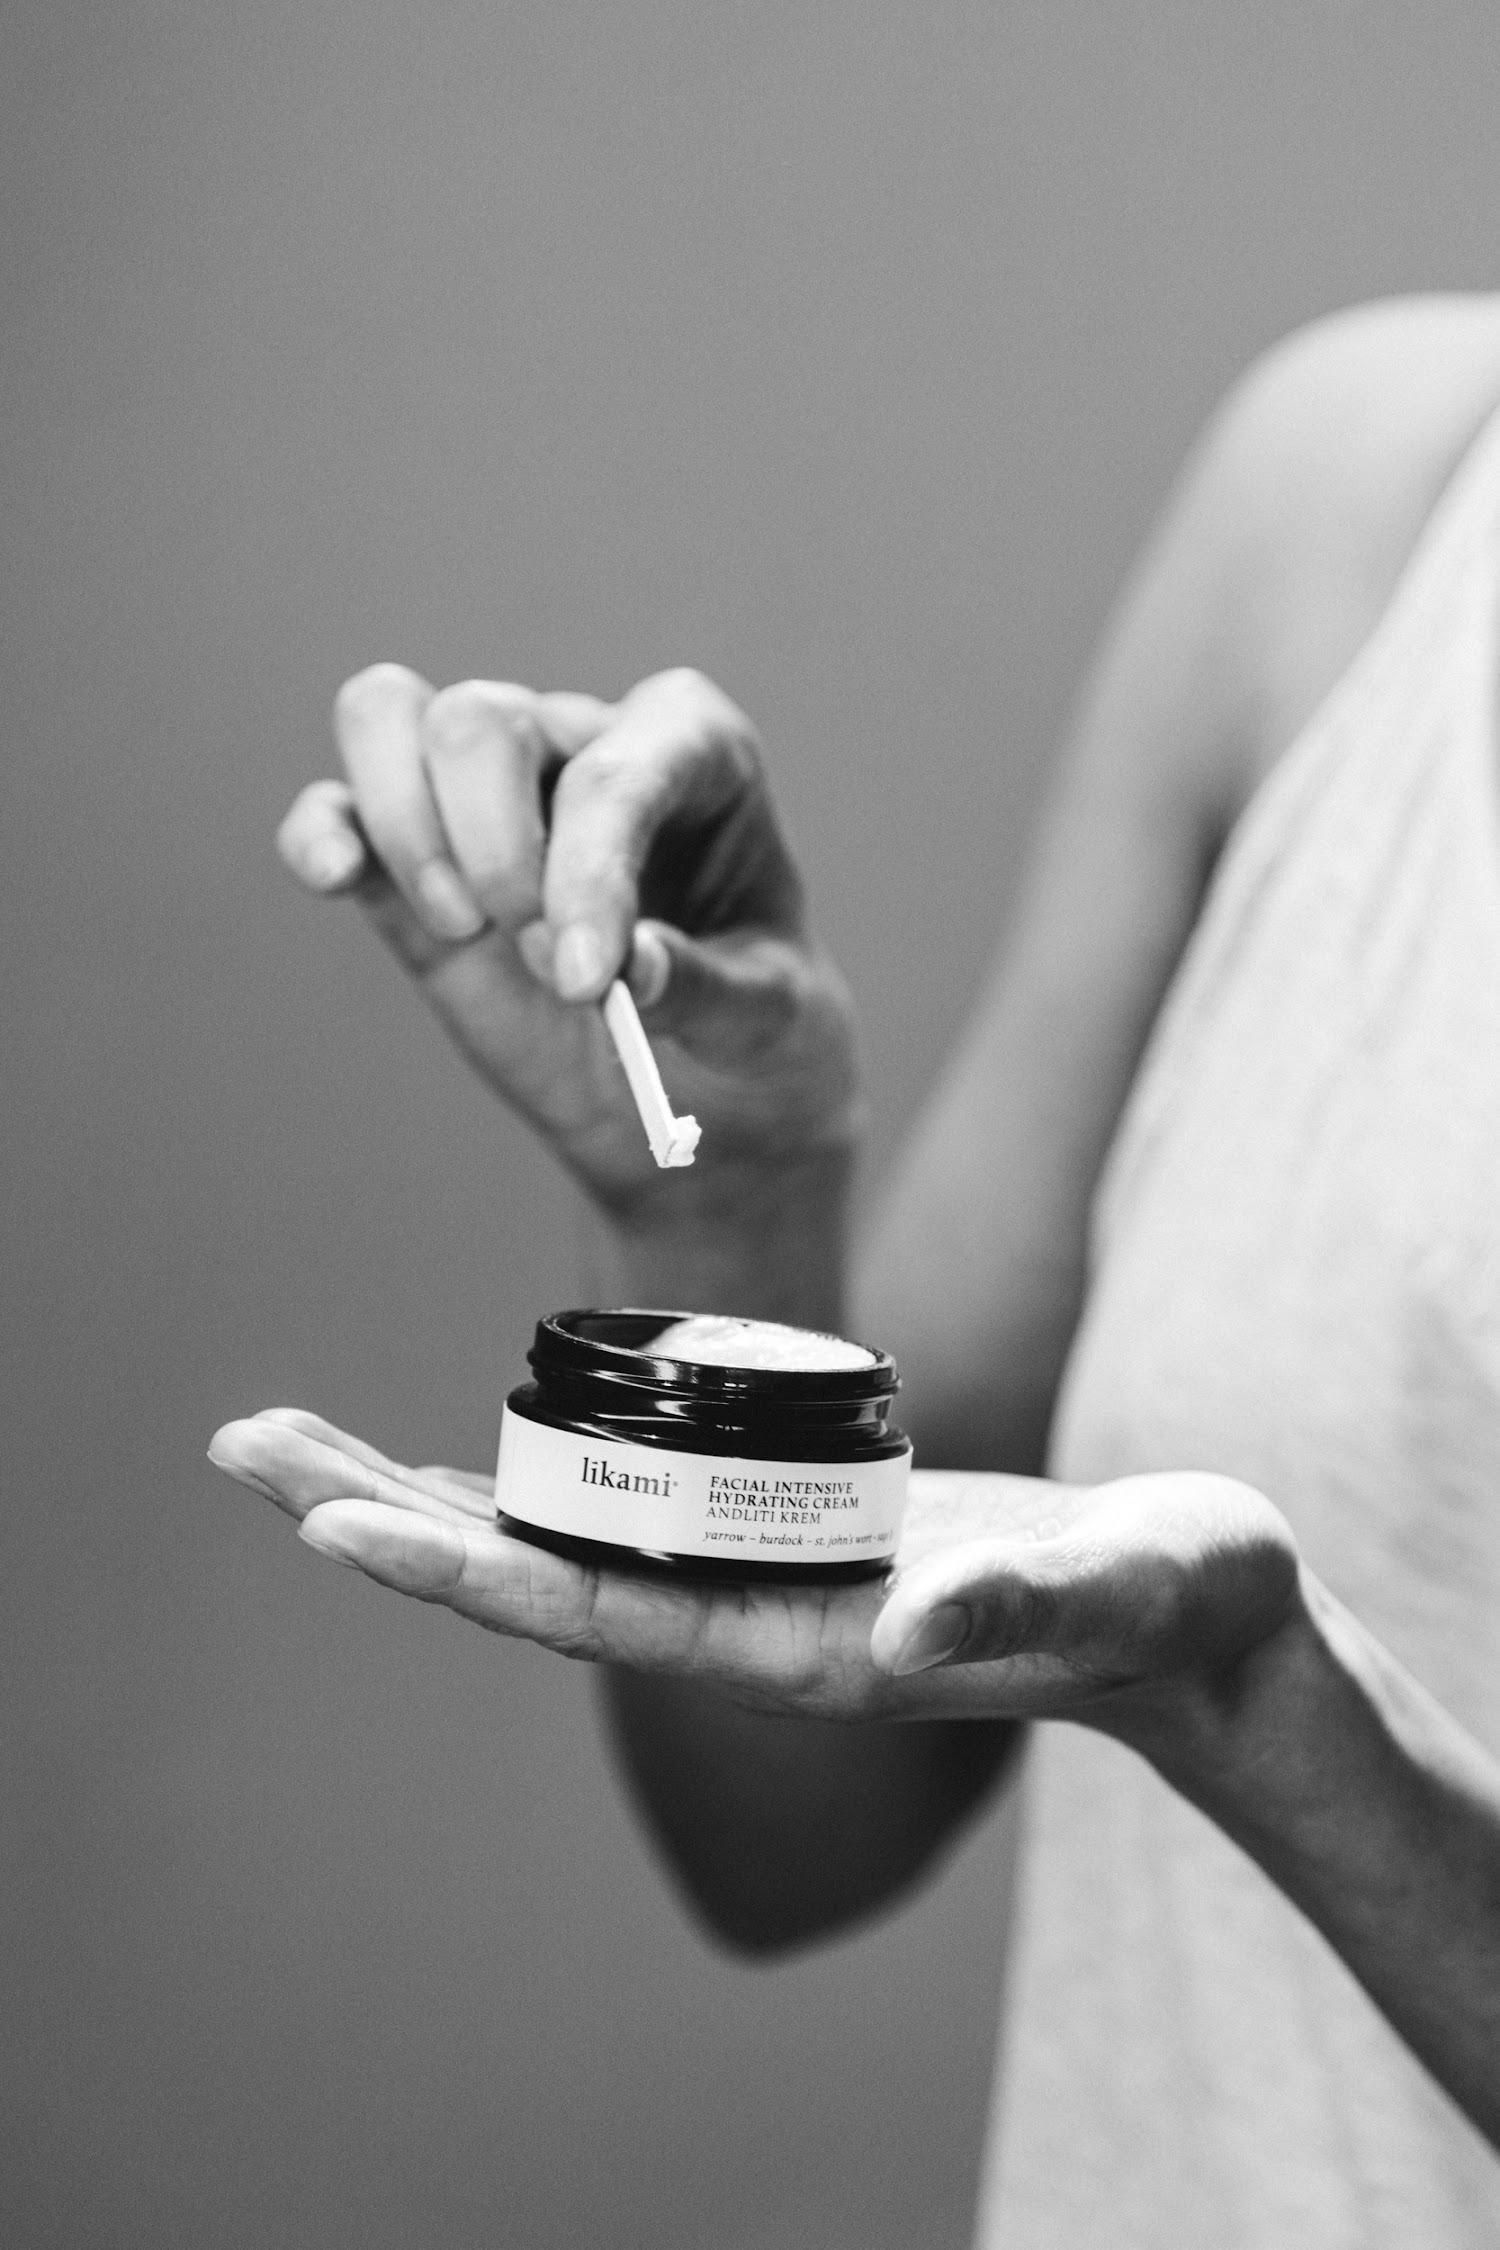 zenhuis Likami Facial Cream